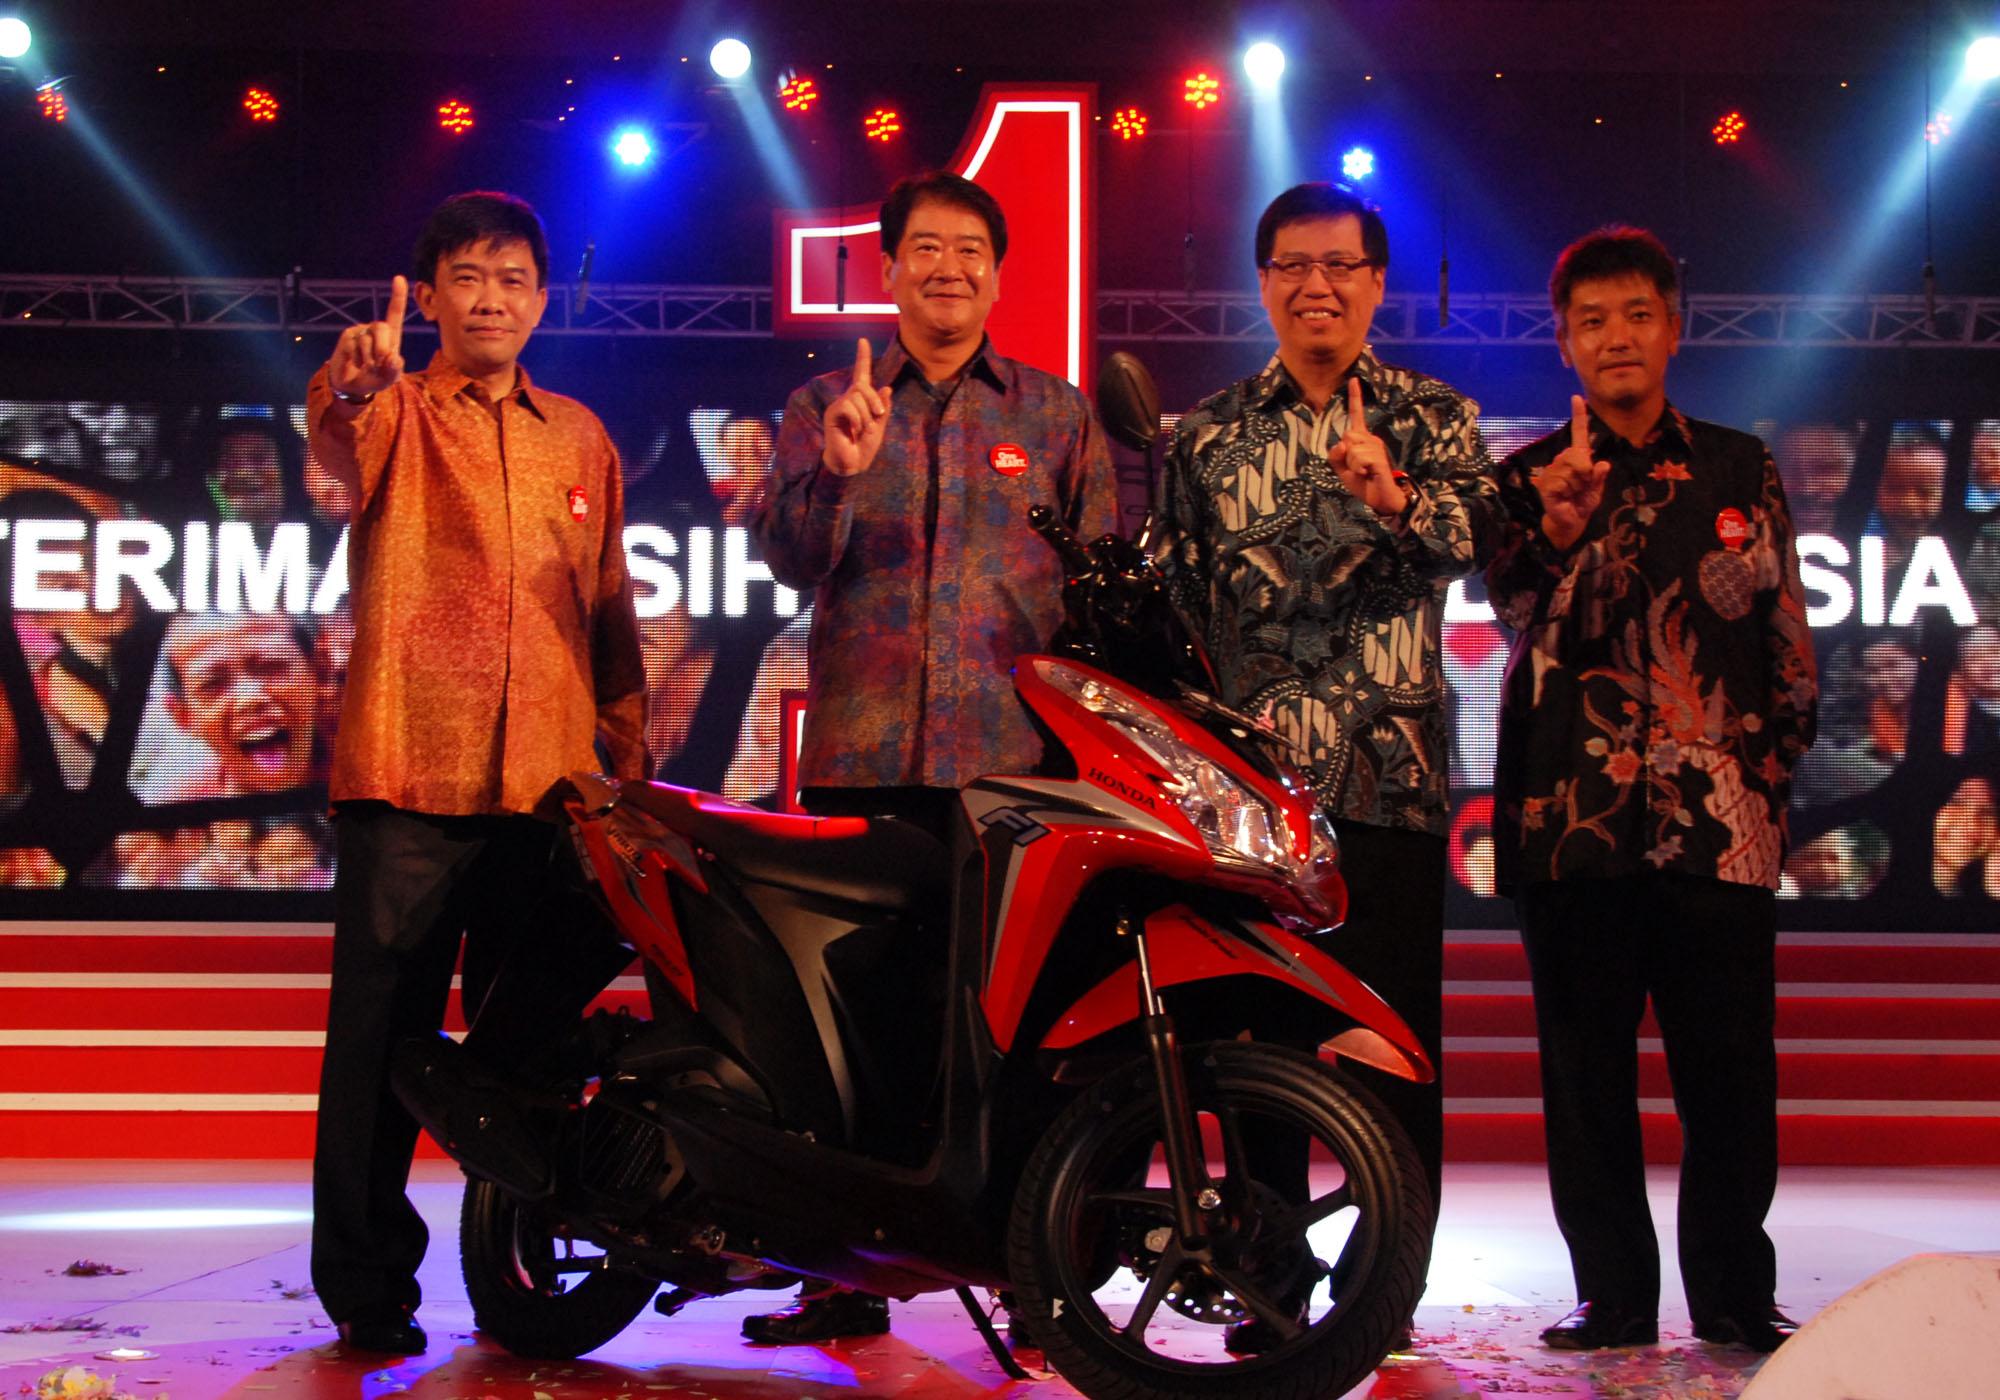 Honda Laman 20 Sugimasihada New Vario 125 Esp Cbs Sonic White Red Kab Semarang Ahm 001